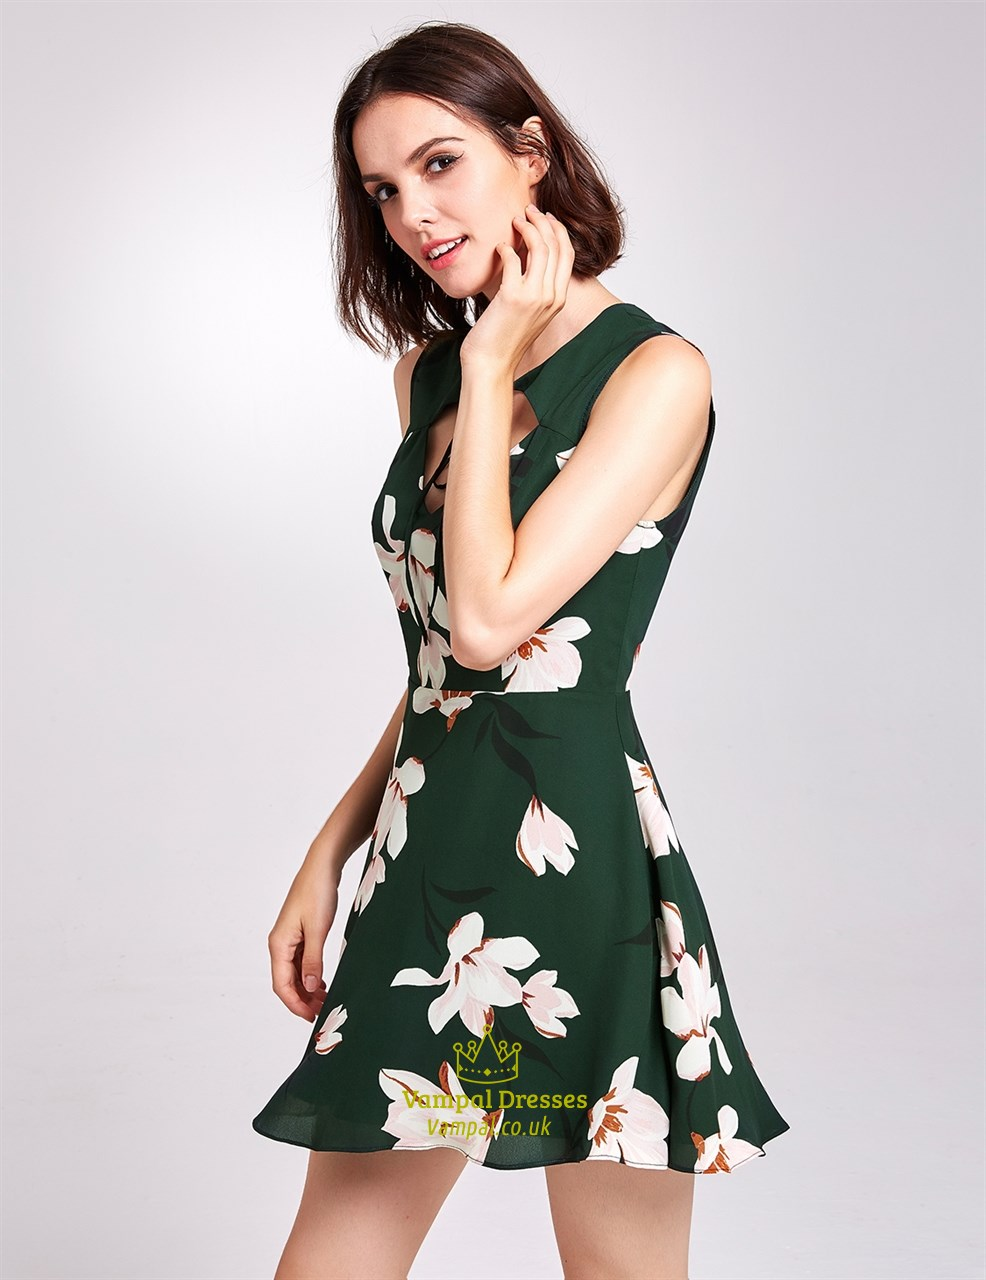 a33f1bd57f70 Dark Green Floral Sleeveless Knee Length A-Line Dress With Keyhole ...